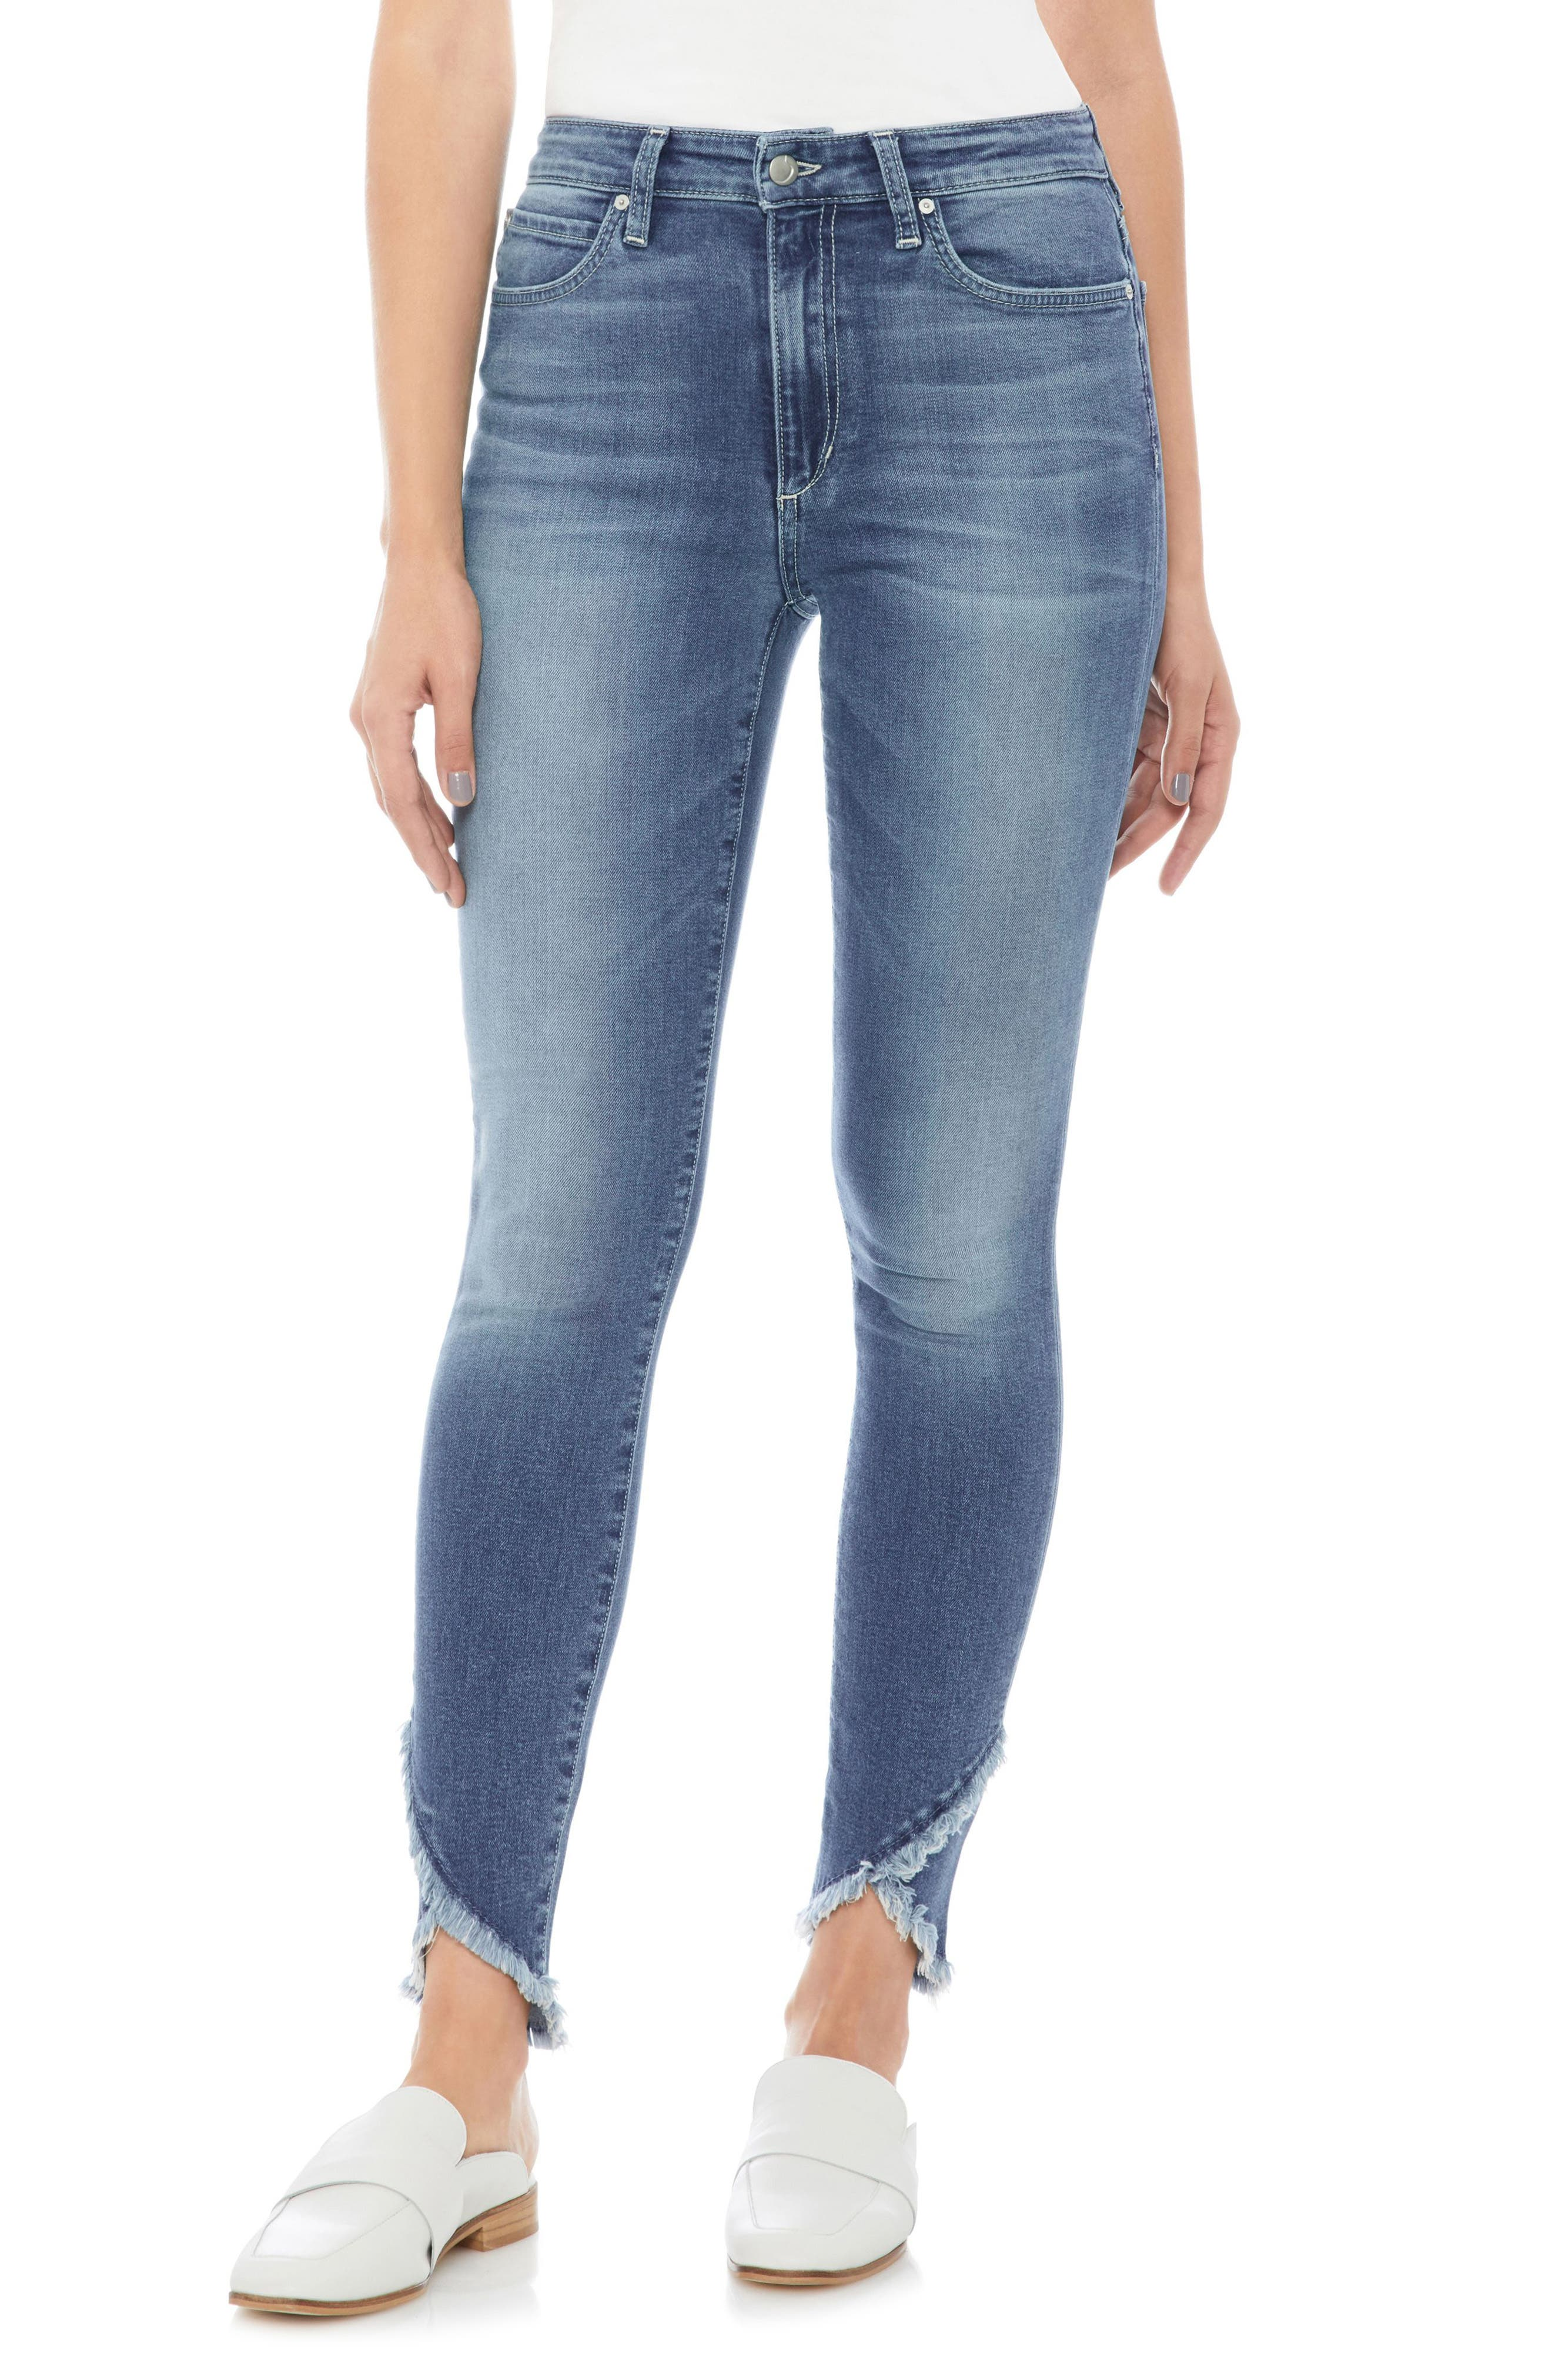 JOE'S Charlie High Waist Tulip Hem Ankle Skinny Jeans, Main, color, 420